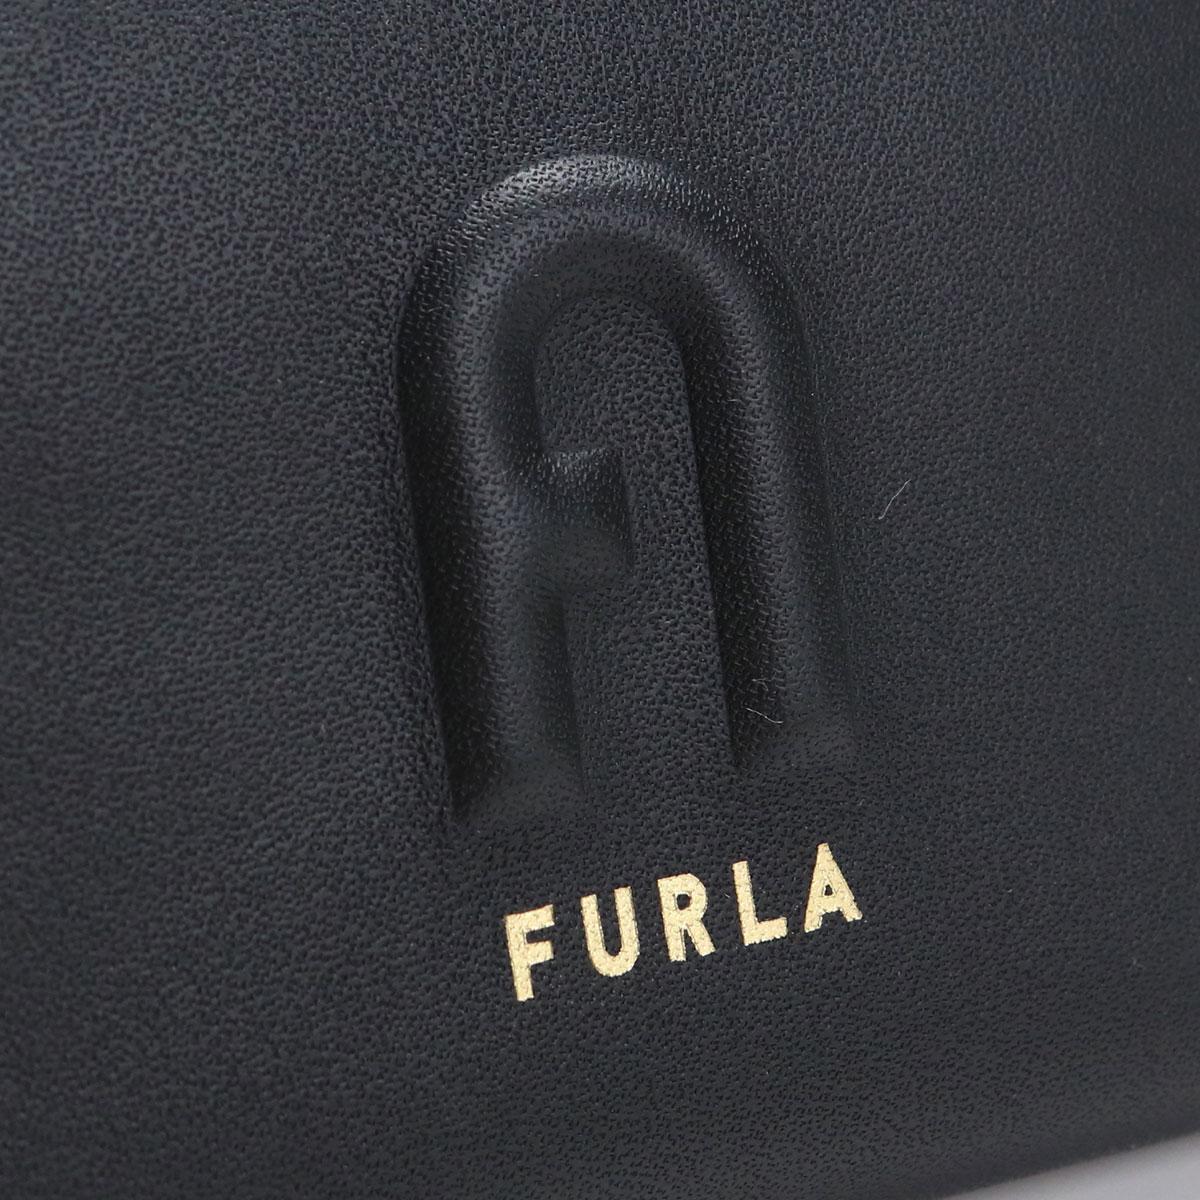 FURLA(フルラ)『リタジップアラウンドウォレット(PDQ2FRI_E35000_1007)』